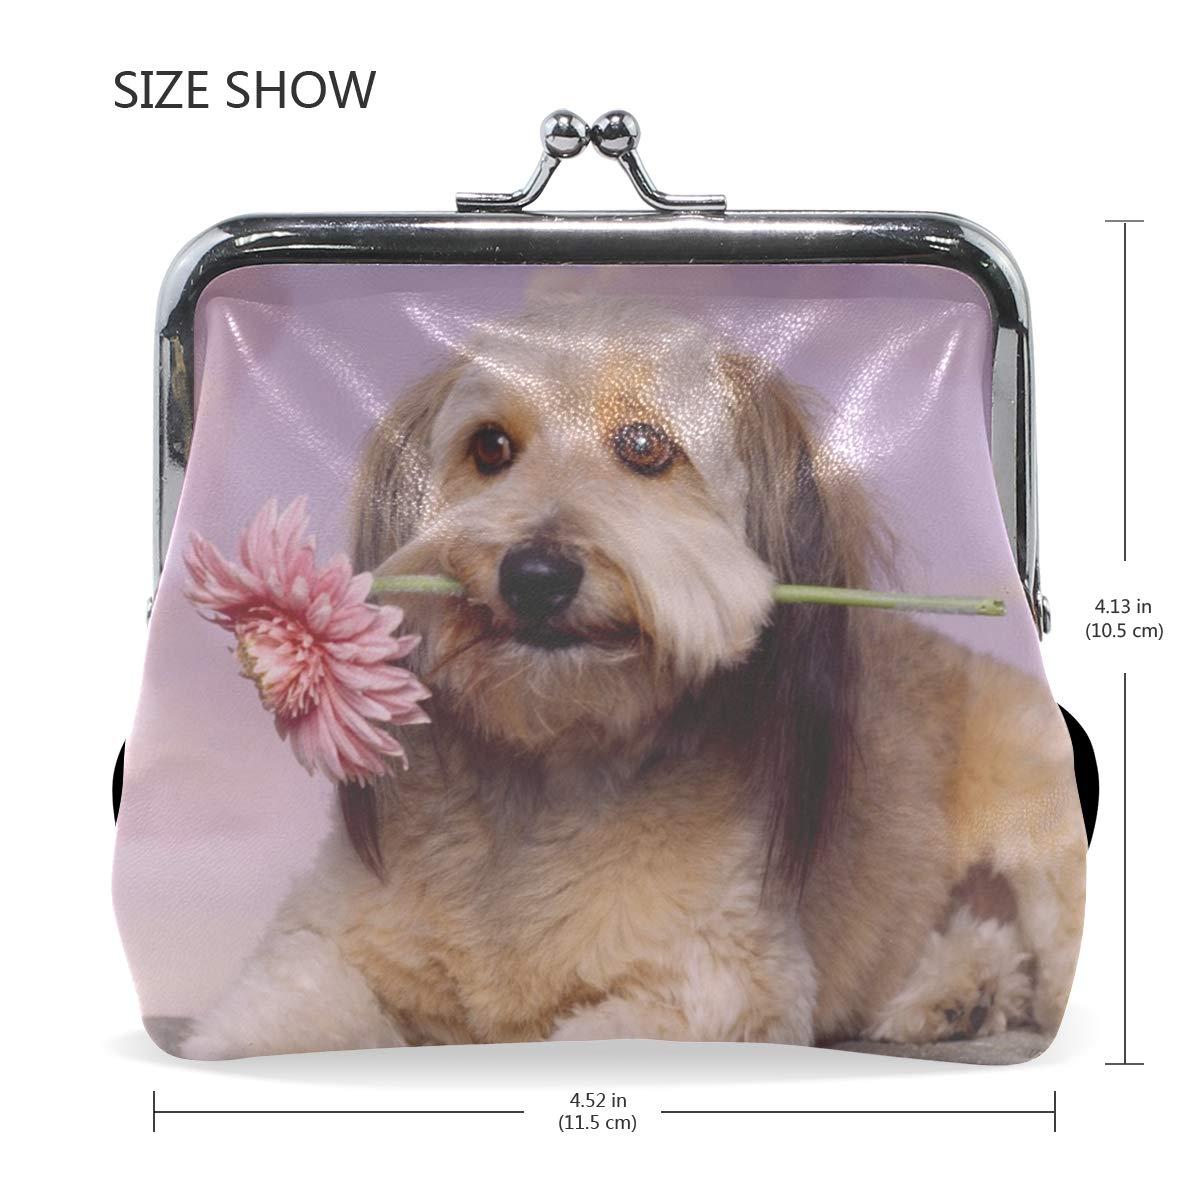 Rh Studio Coin Purse Clasp Closure Dog Muzzle Flower Waiting Print Wallet Exquisite Coin Pouch Girls Women Clutch Handbag Exquisite Gift